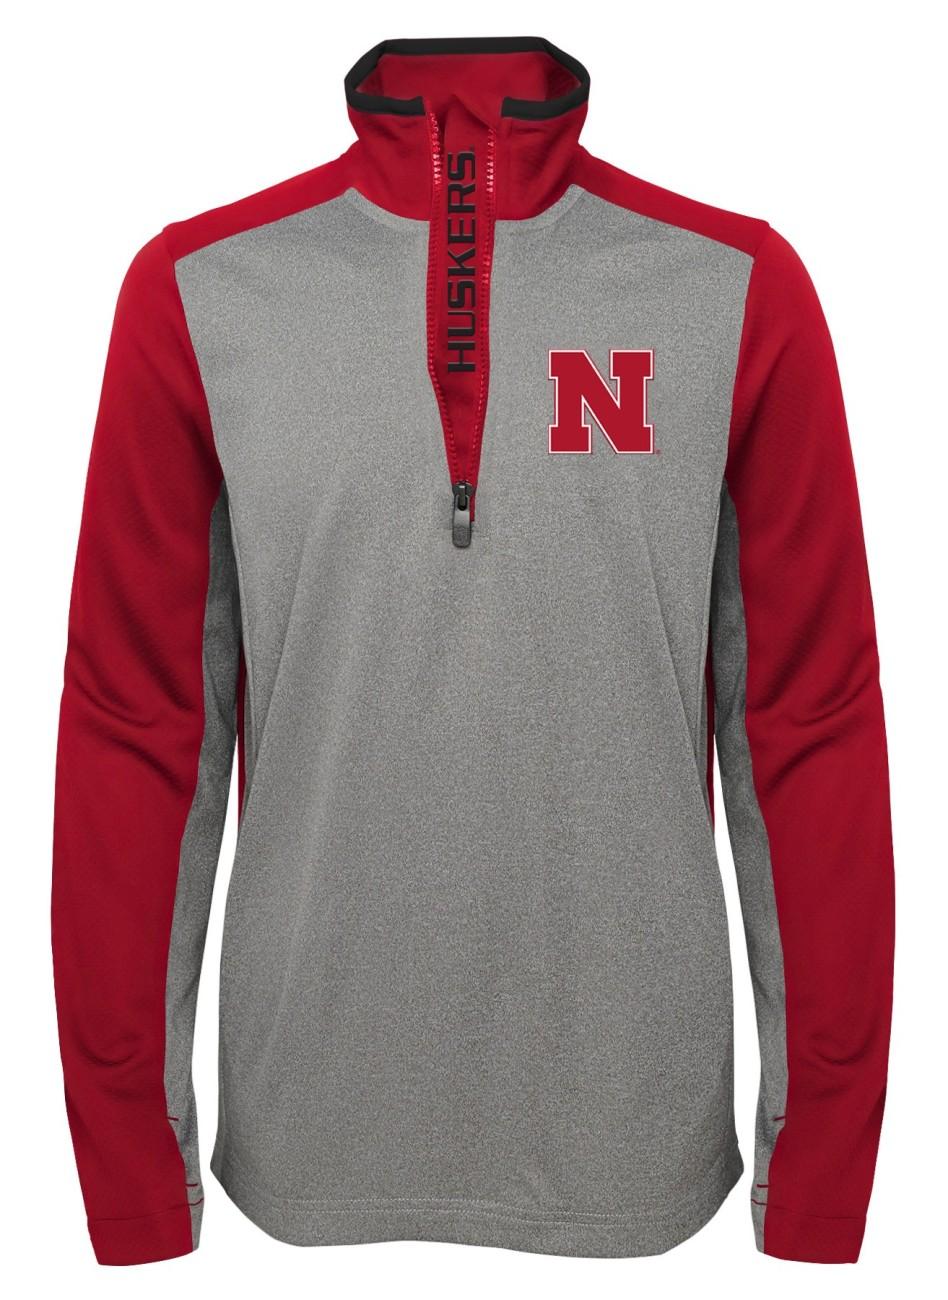 "Nebraska Cornhuskers NCAA ""Top Notch"" Men's 1 4 Zip Mock Neck Jacket by Gen2"